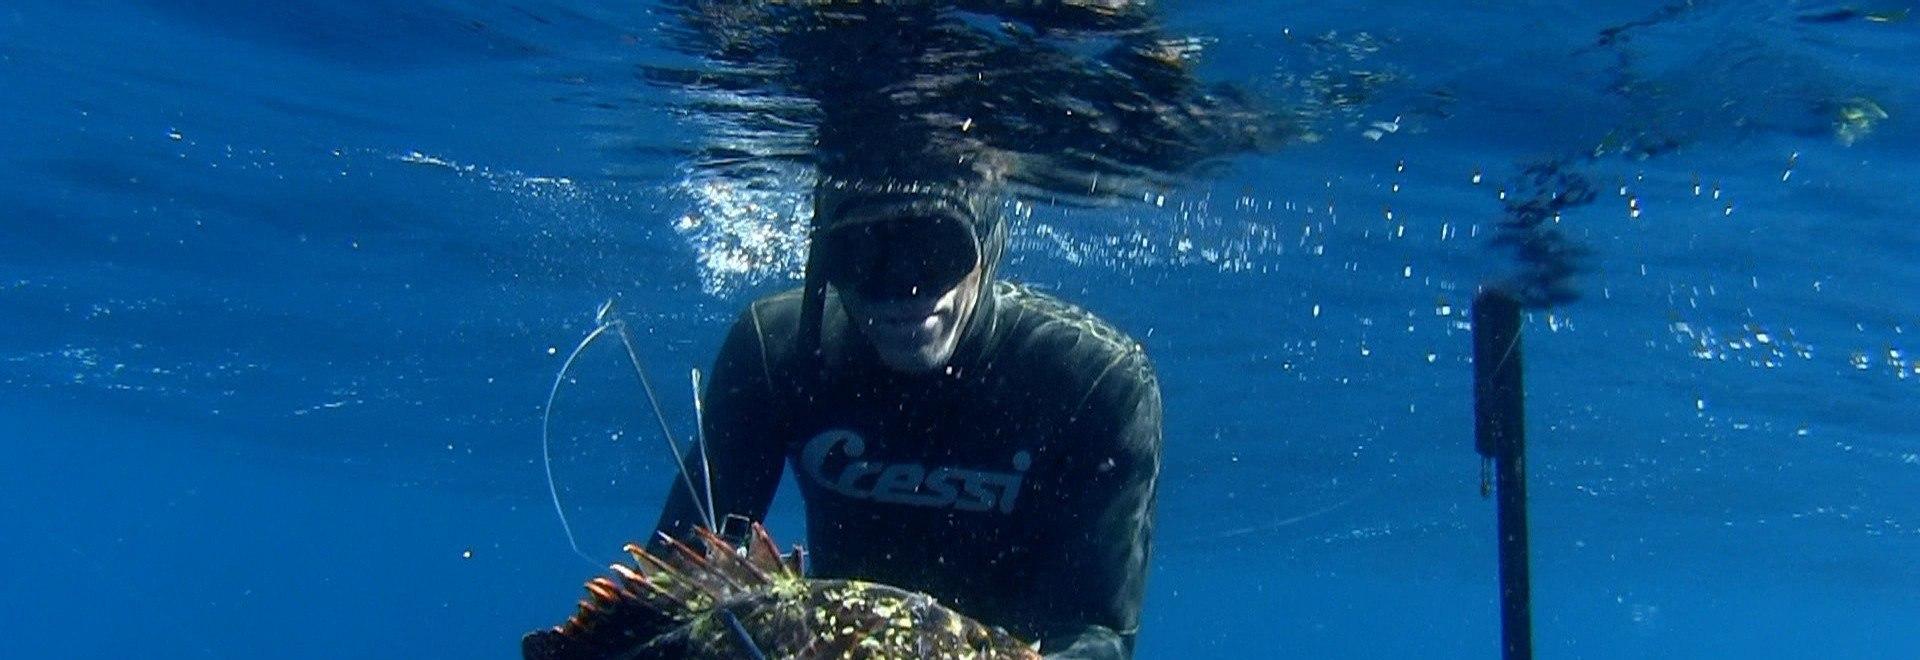 Pesca in apnea, amicizia e risate